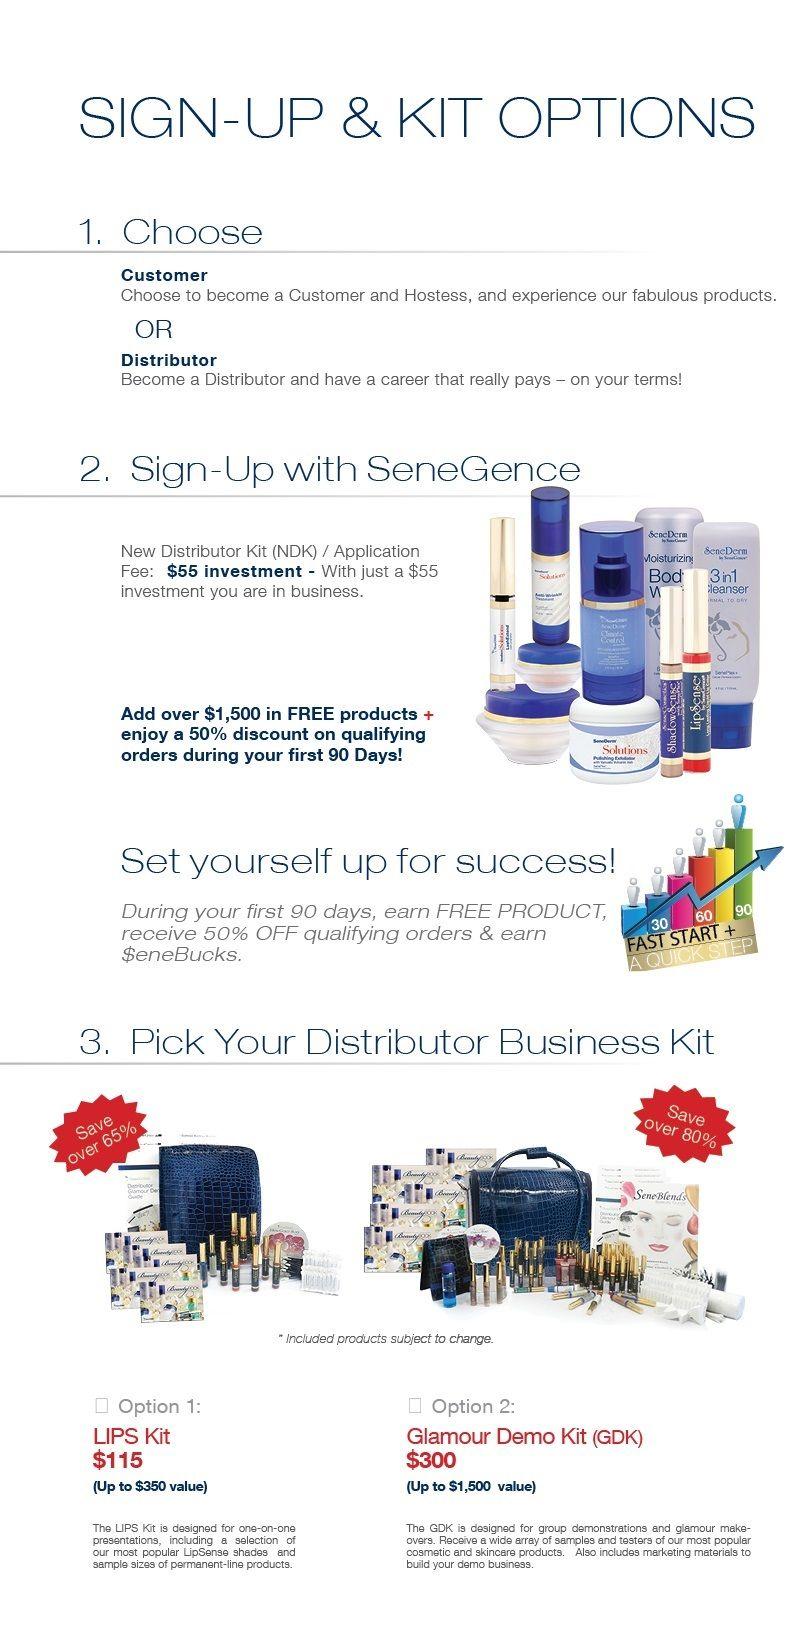 Sell Senegence and LipSense, buy LIPS Kit or Glamour Demo Kit